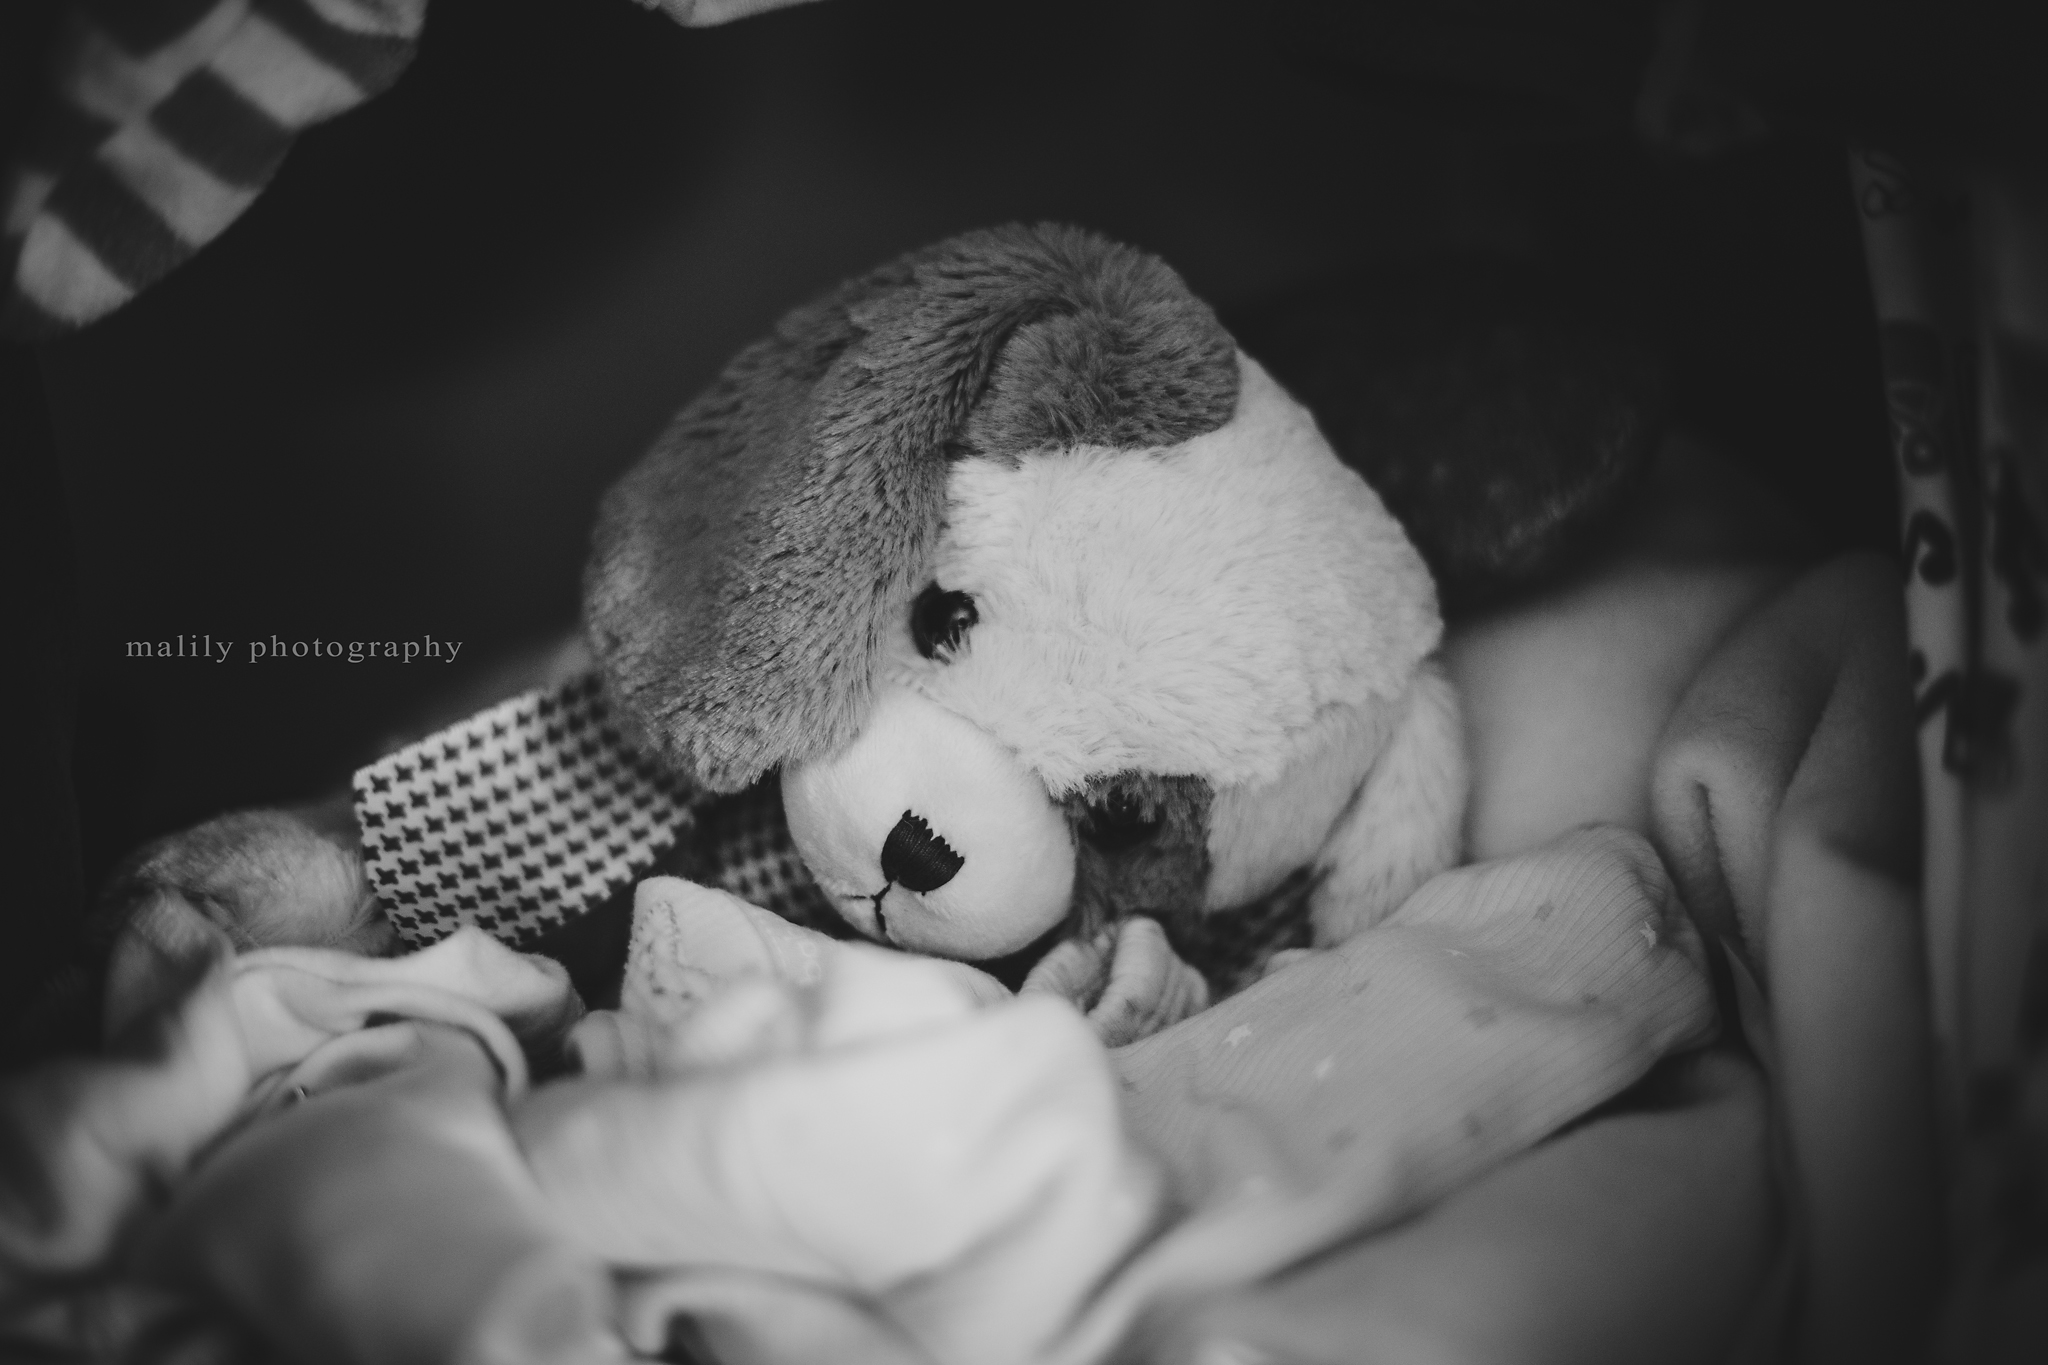 malily photography | auburn newborn photographer